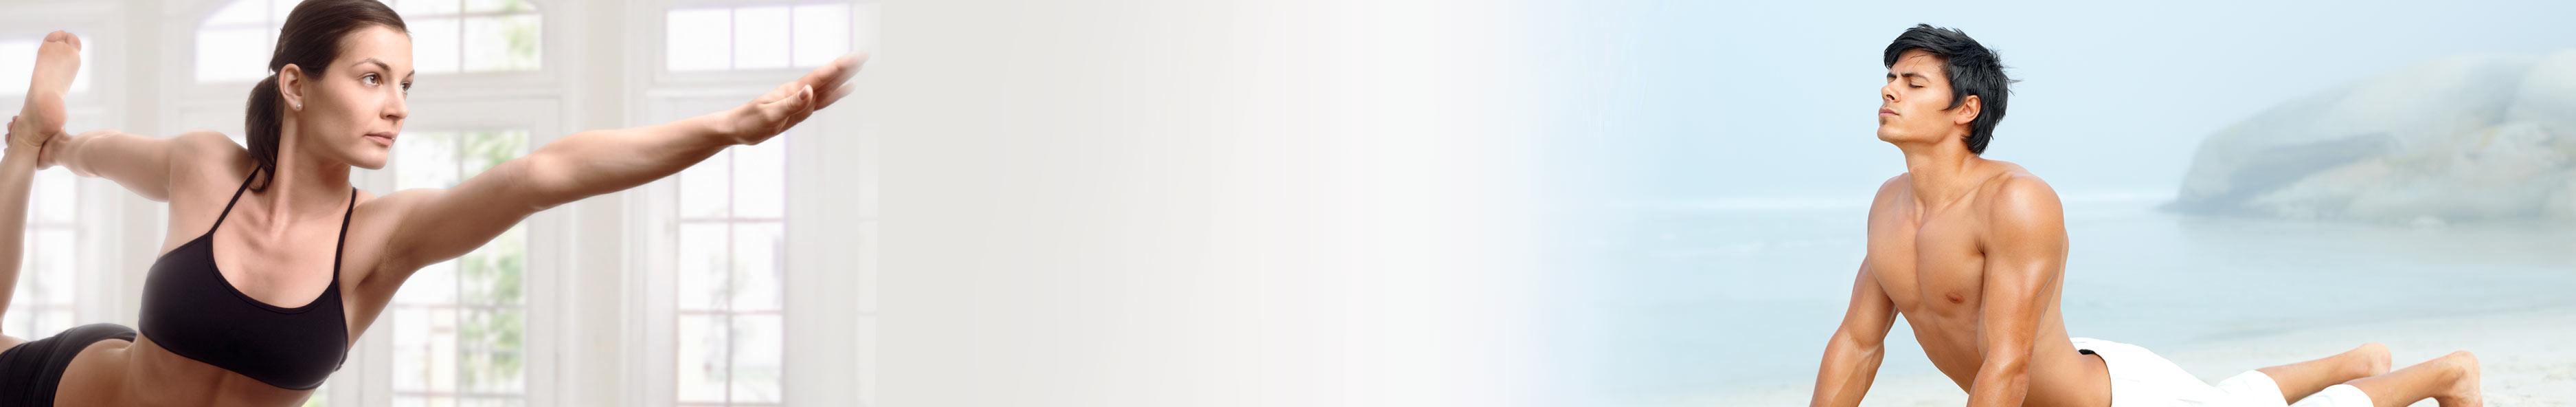 Nylon Moisture Management Fibers